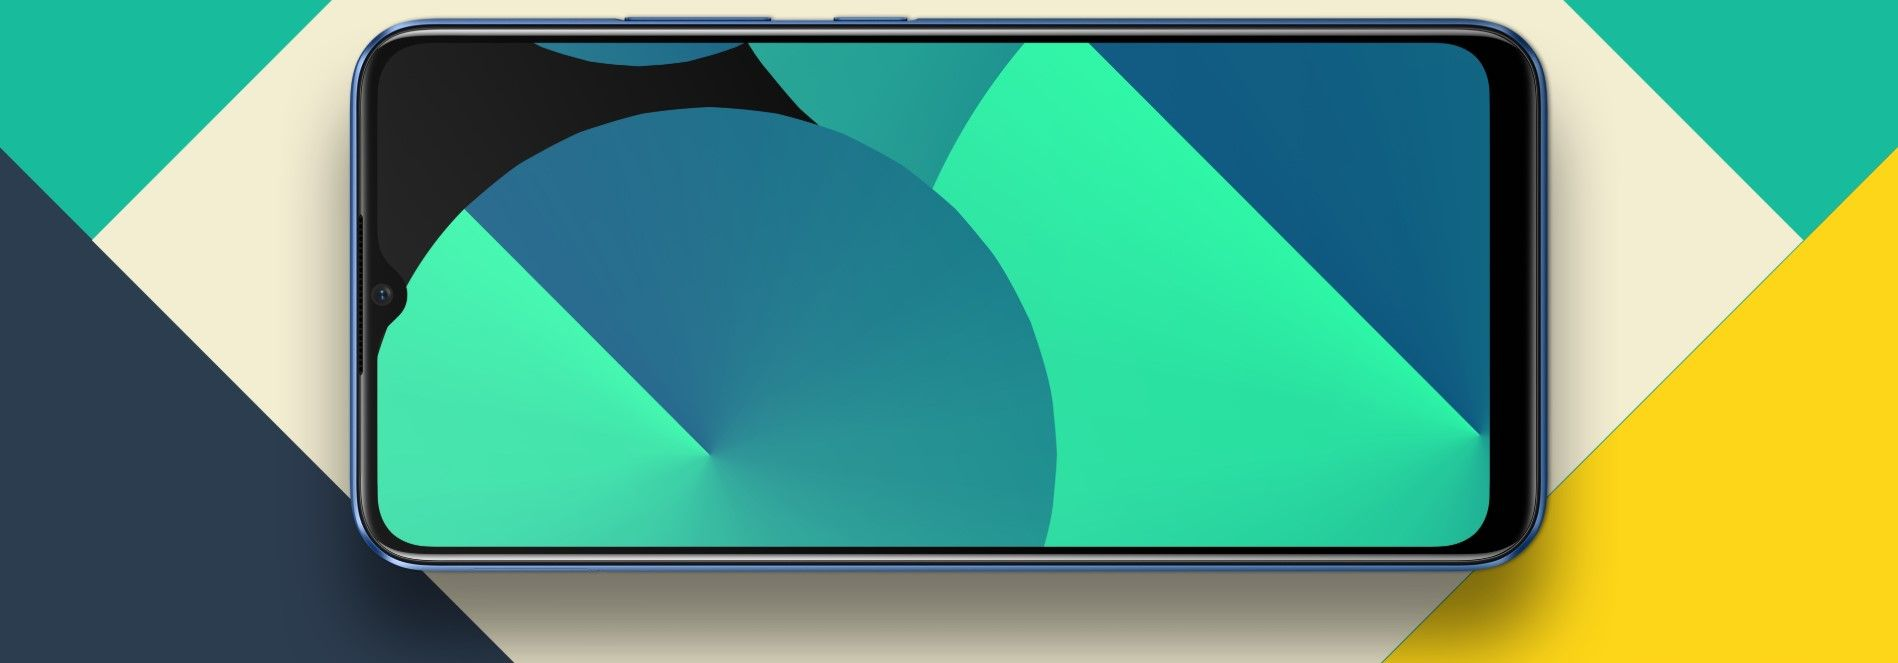 Смартфон Realme C15 дисплей 6.5 дюйма